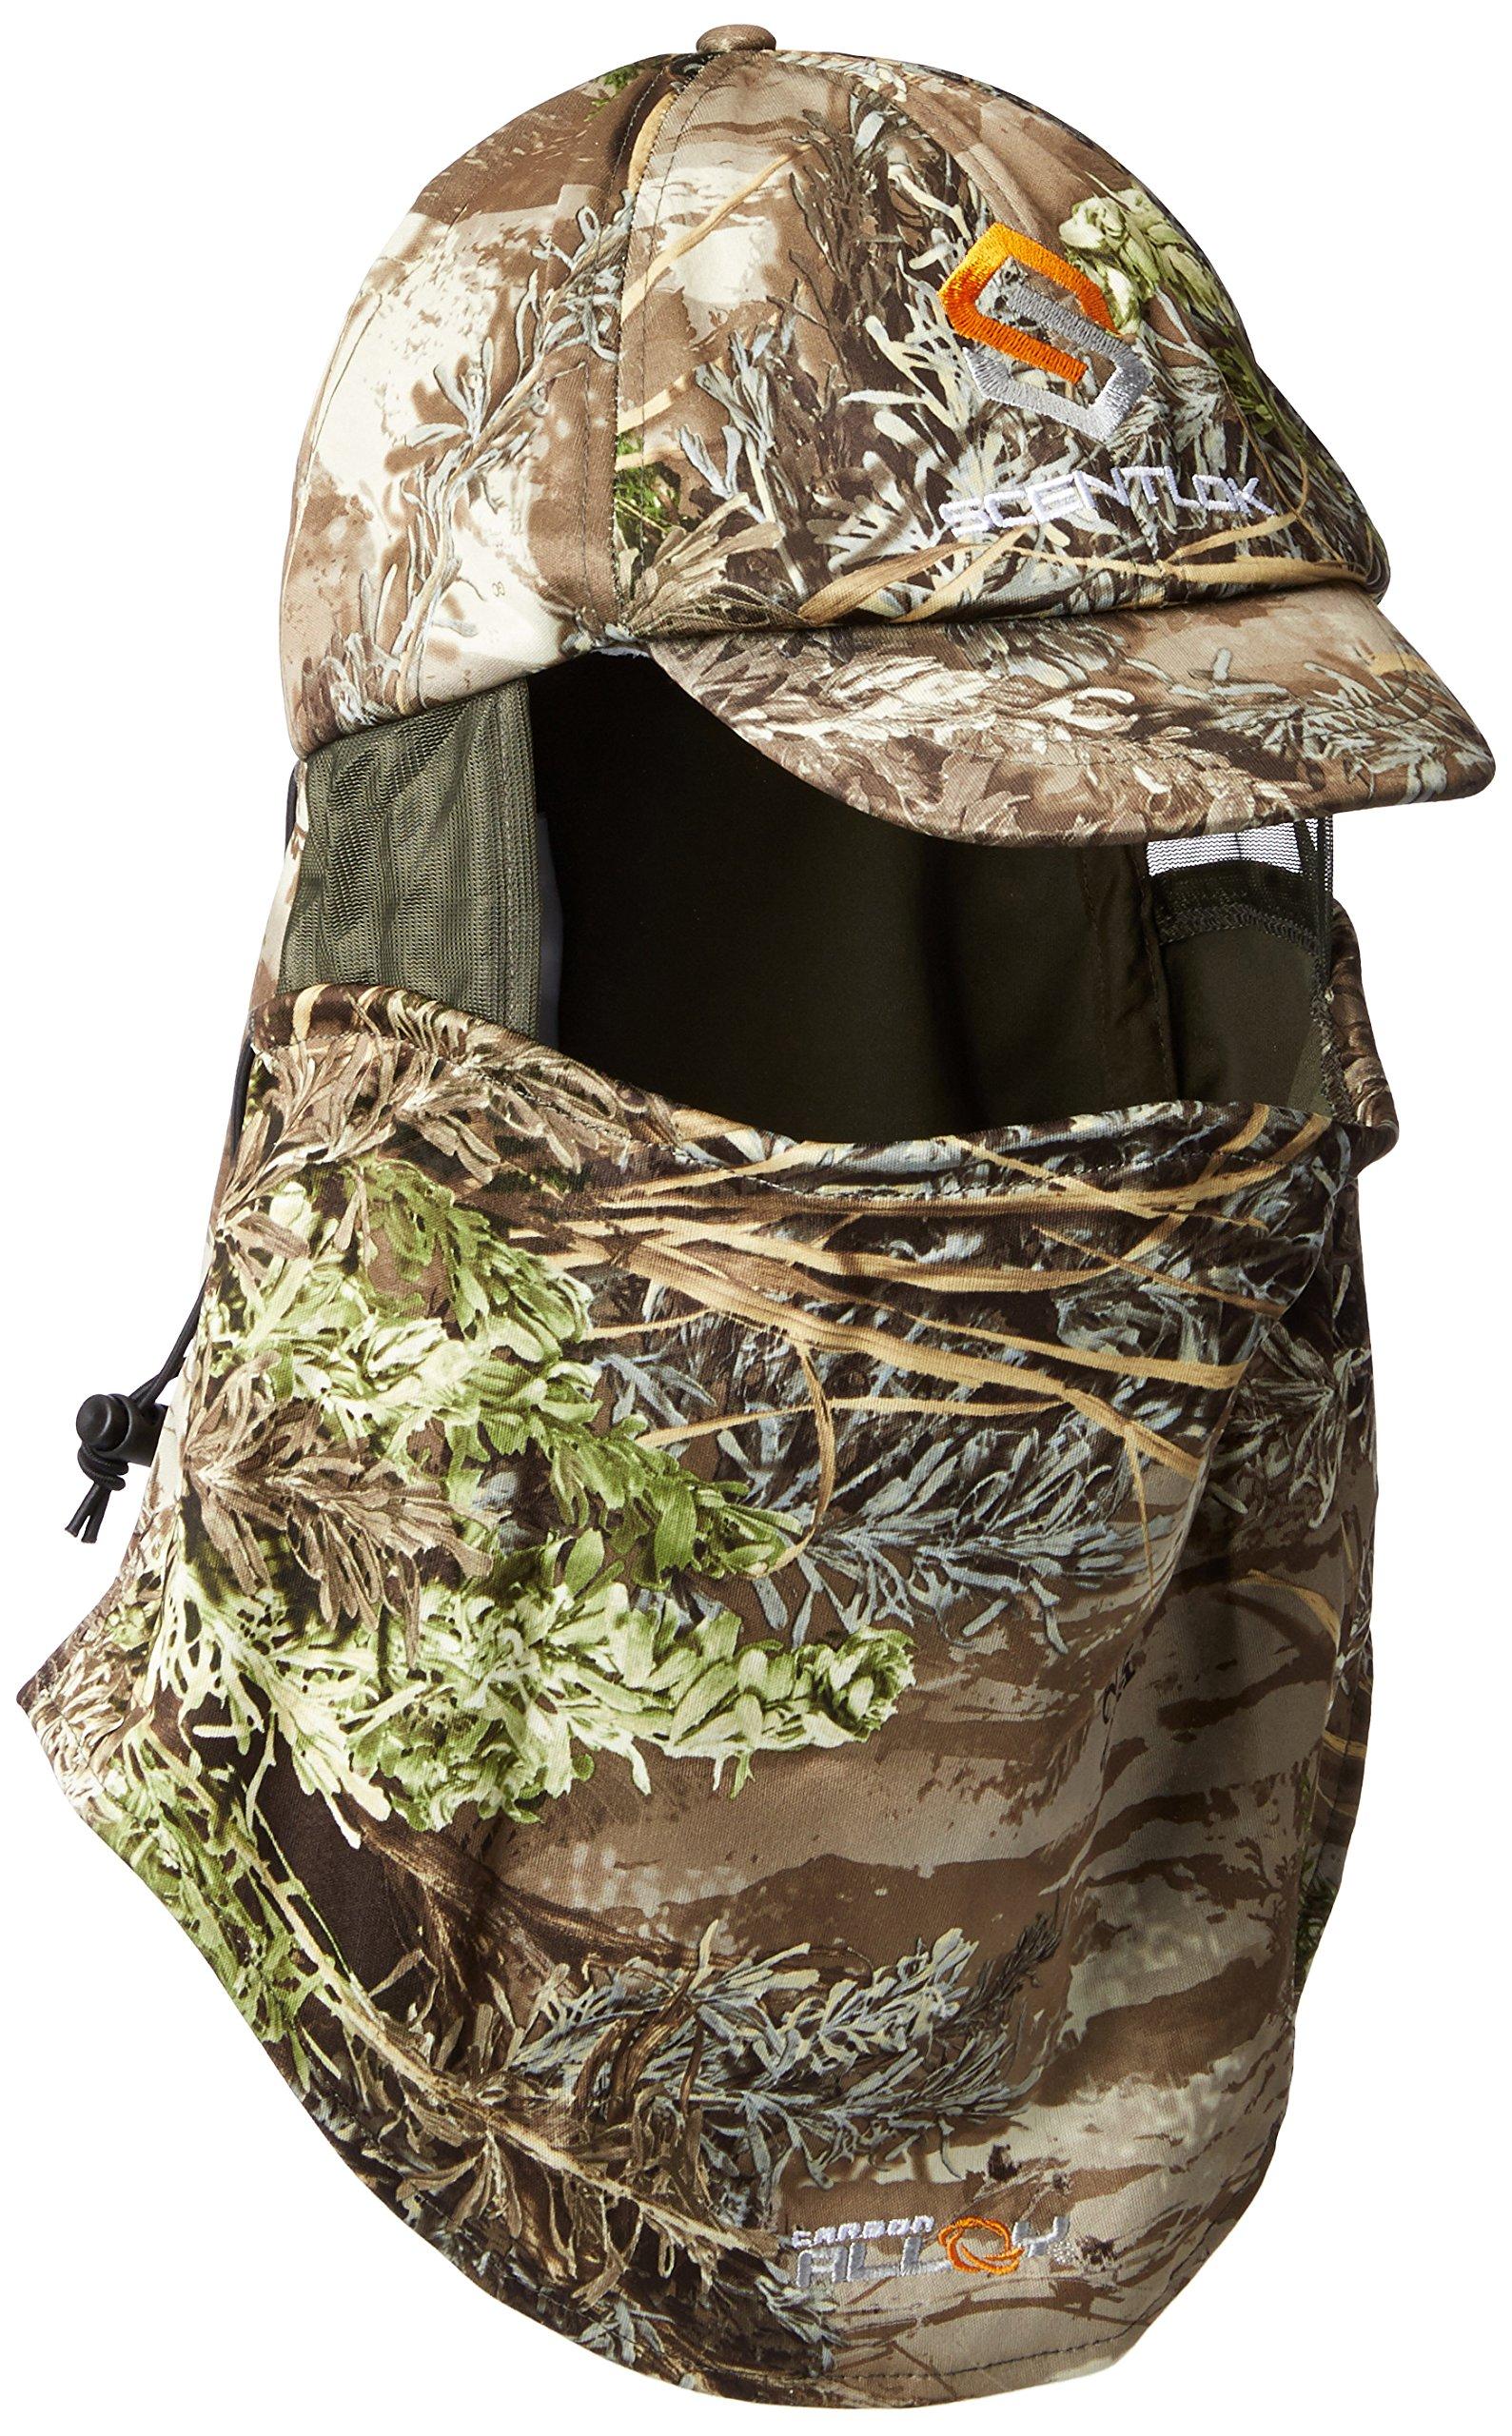 ScentLok Men's Savanna Ultimate Lightweight Headcover, Realtree Max, One Size